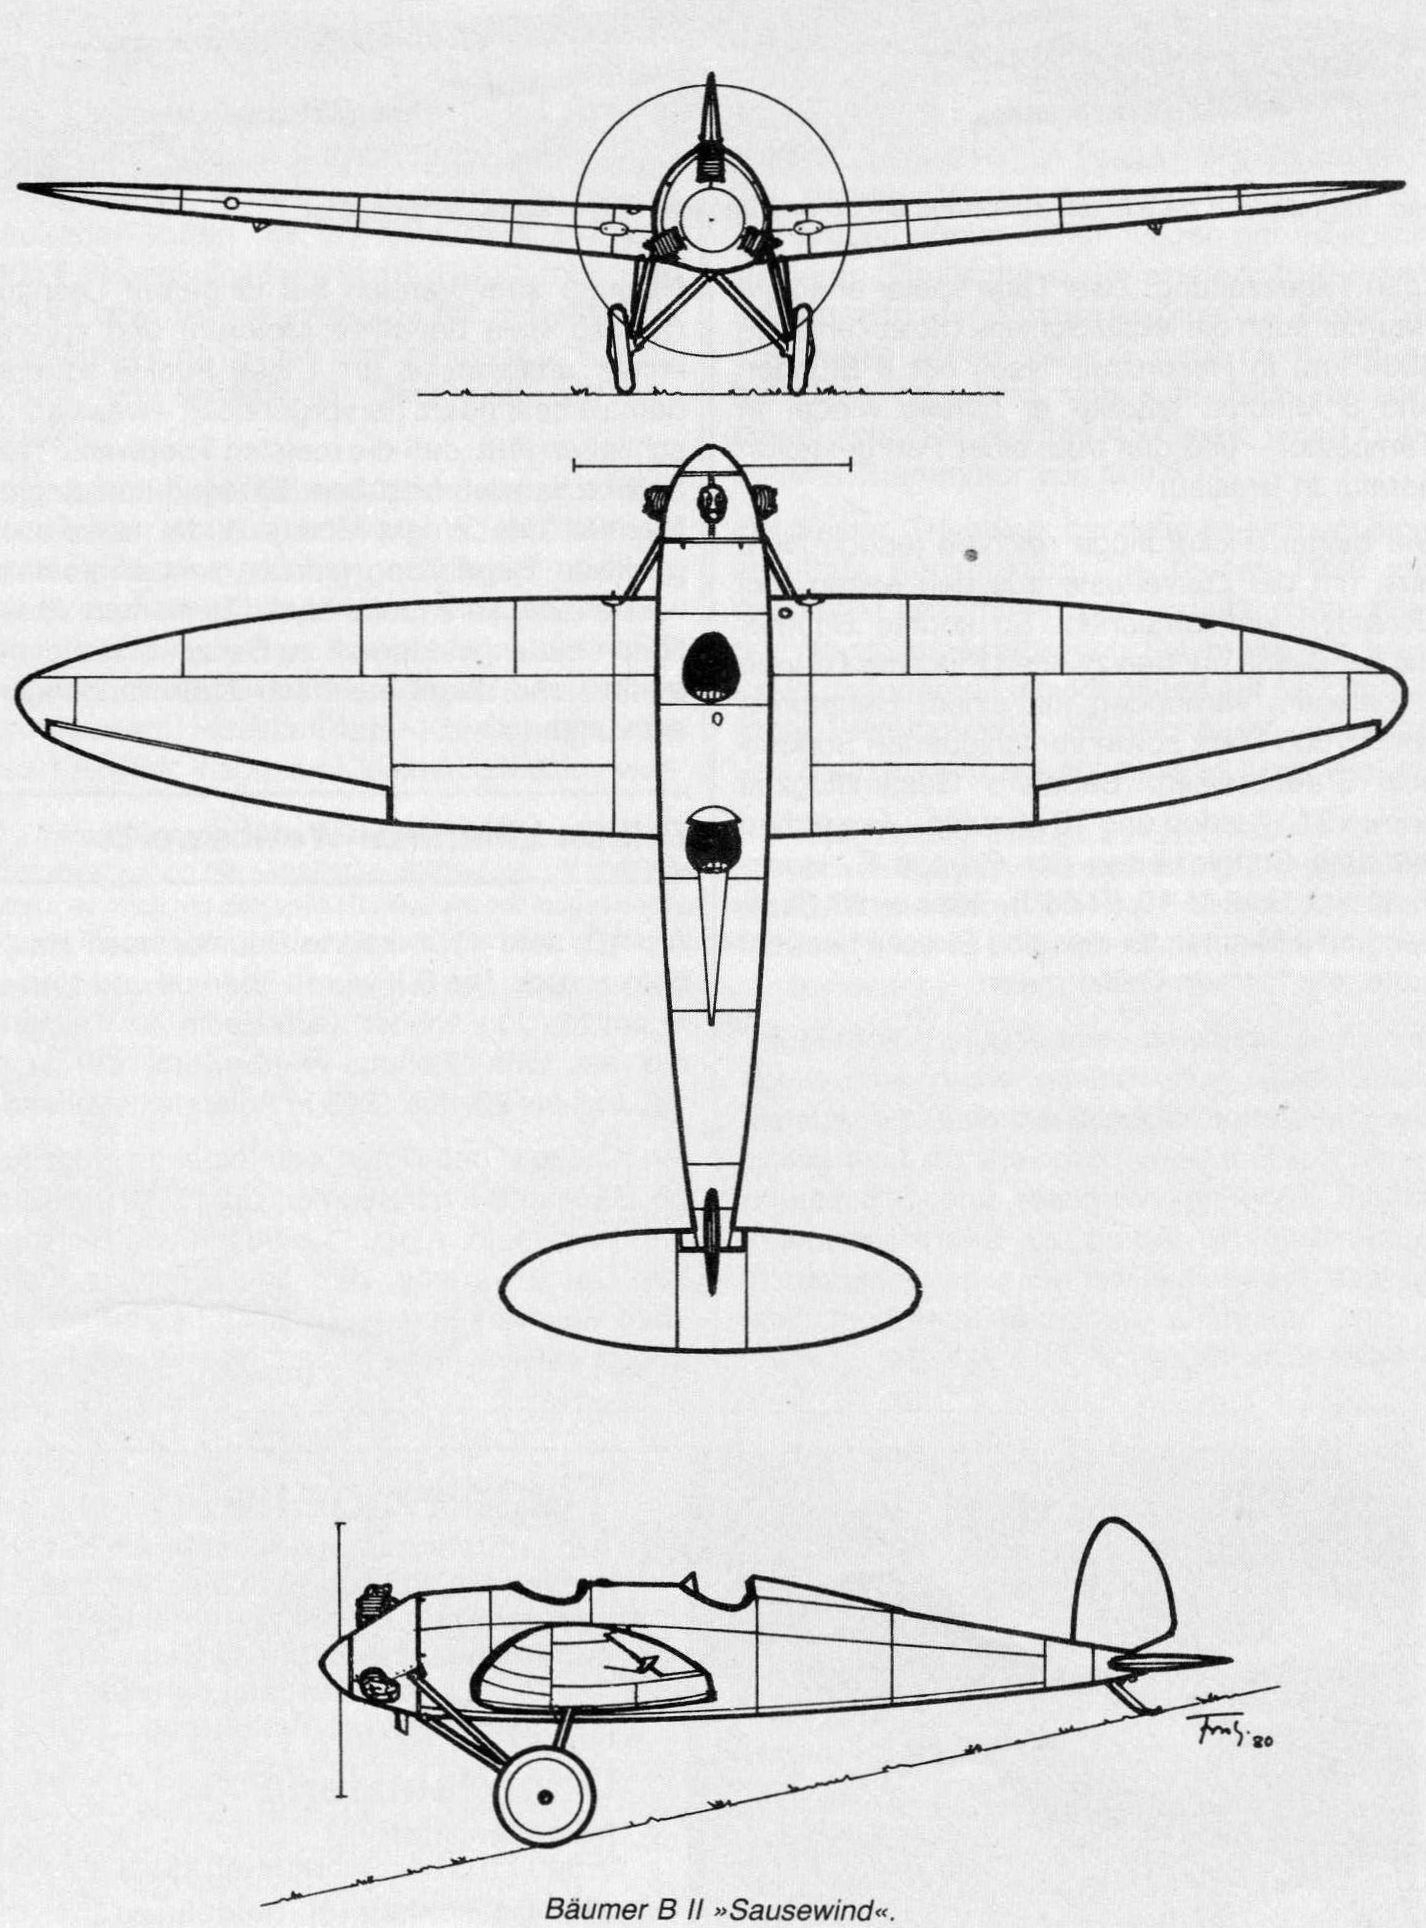 Diagram Of An Airplane Bumer B Ii Sausewind 1925 German Sports Plane